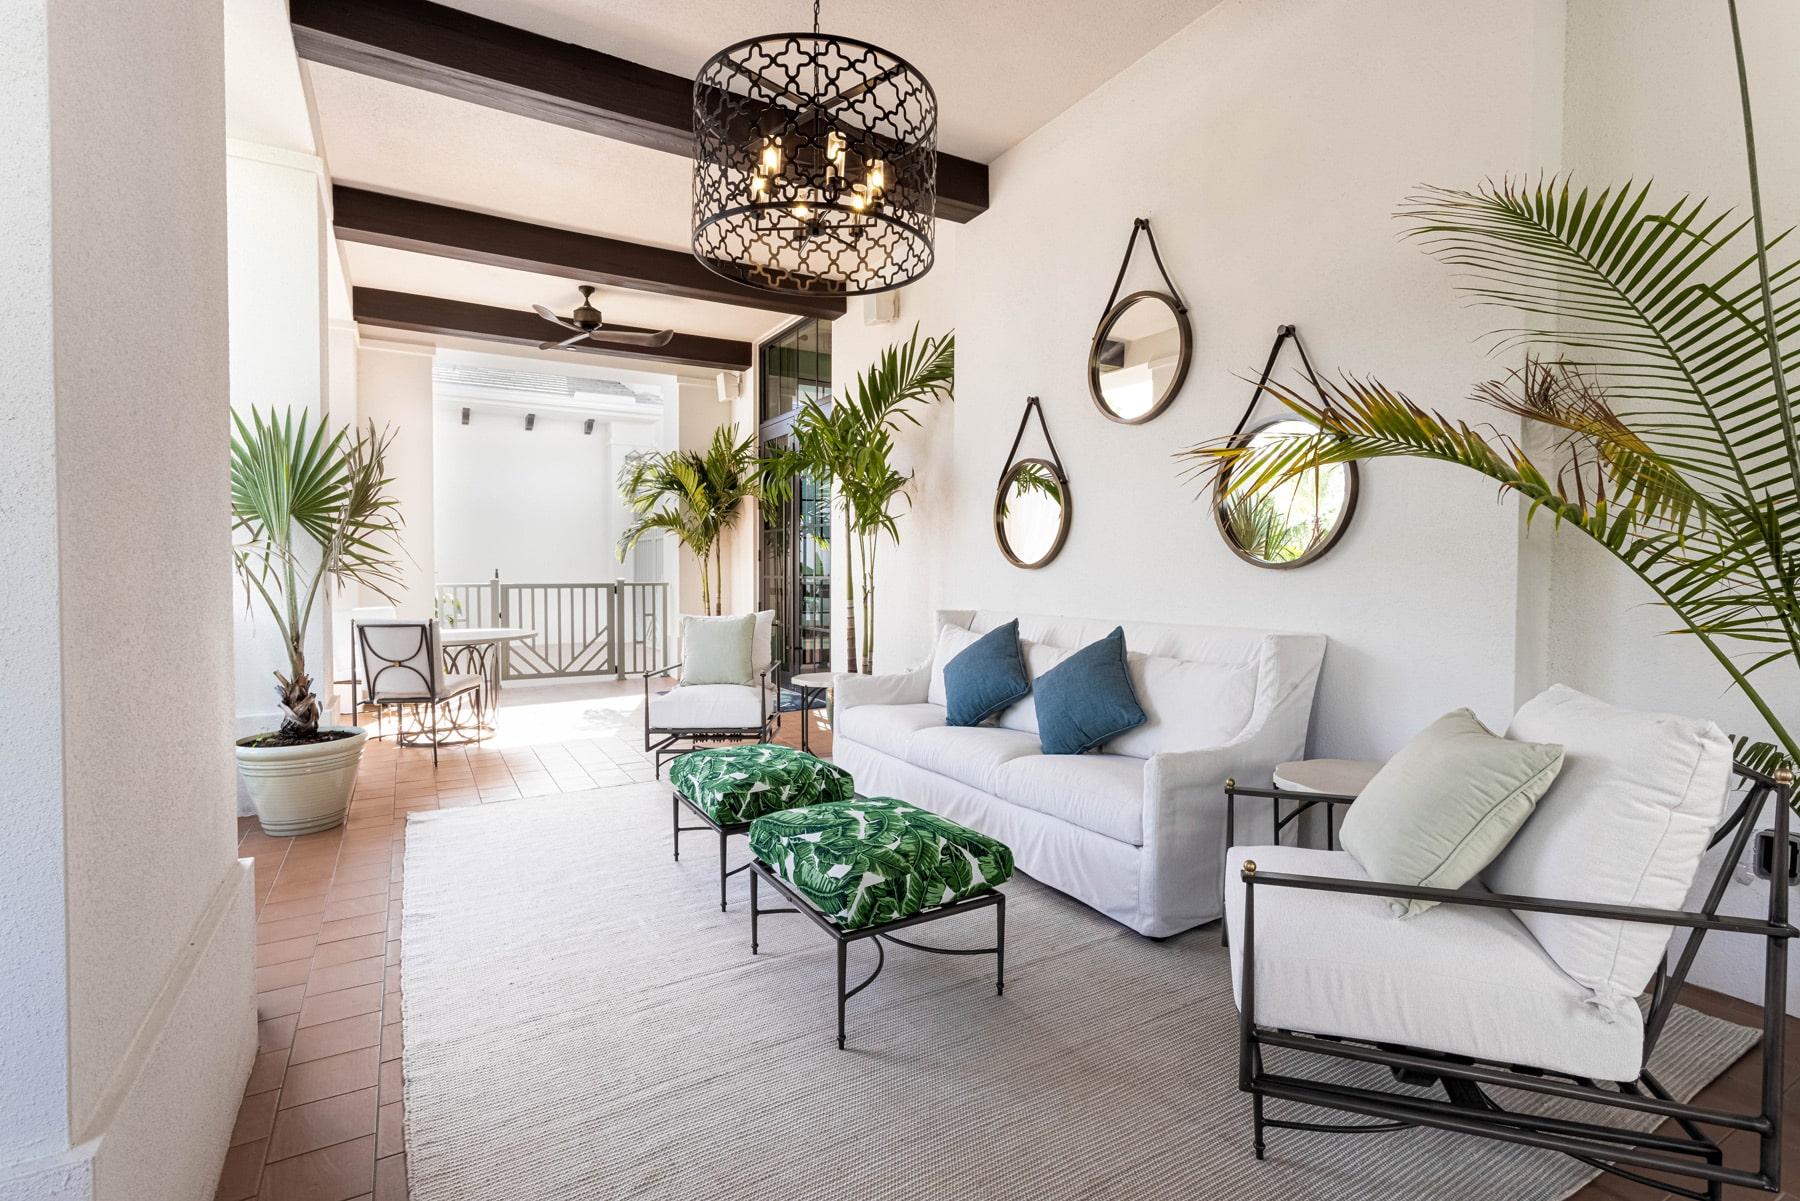 Town Village Walk | Interior Area 3 | Fort Myers, FL | Multifamily | Interior Designers